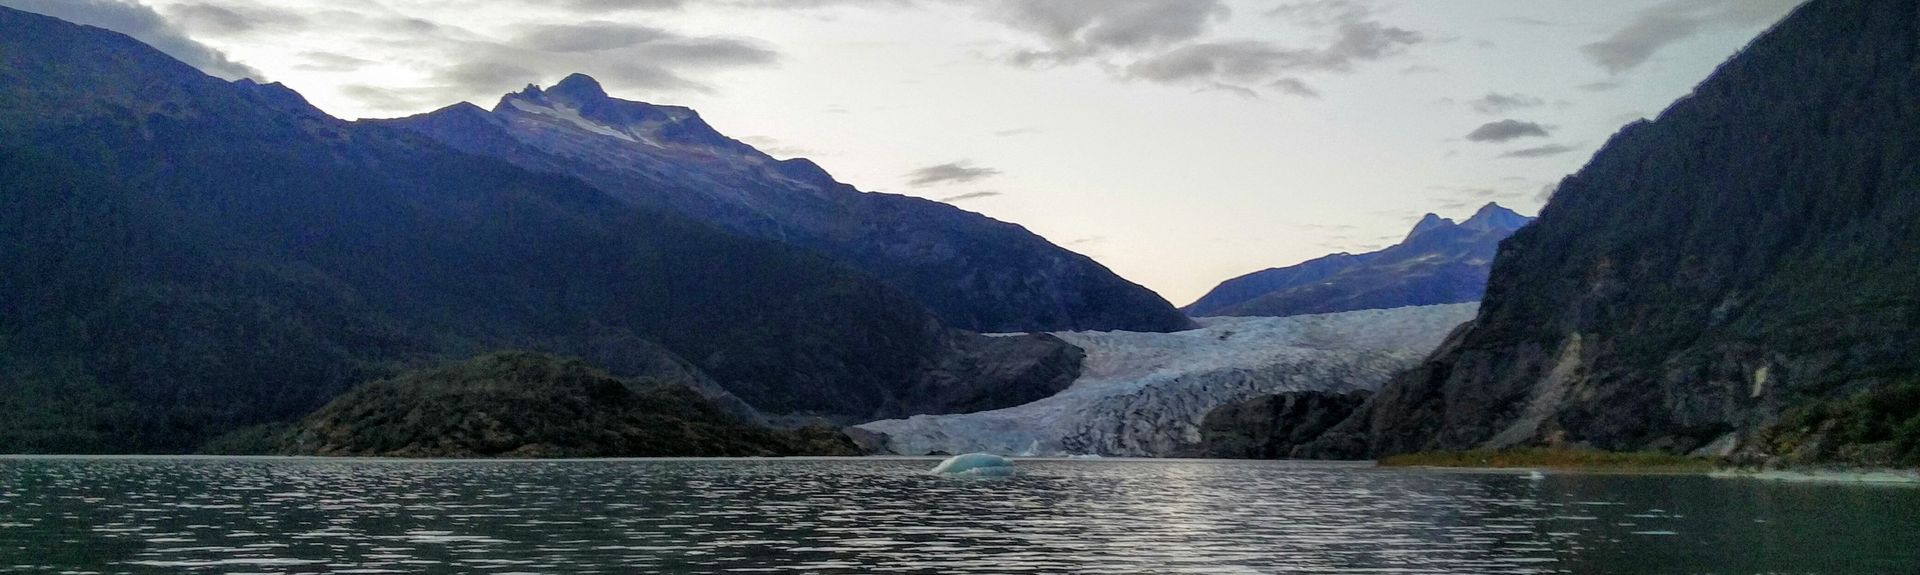 Mount Roberts Tramway, Juneau, Alaska, United States of America